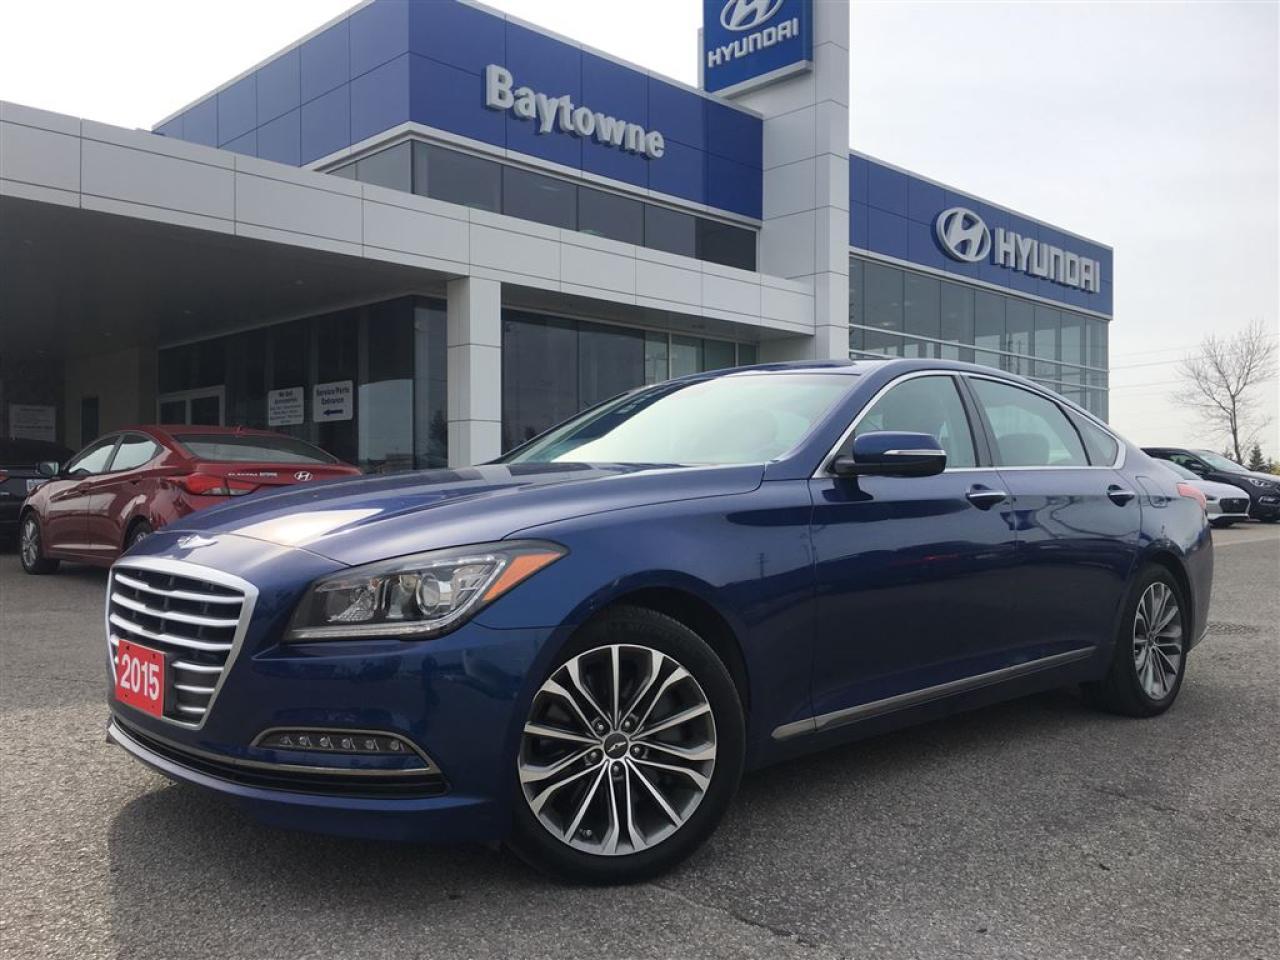 2015 Hyundai Genesis 3.8 Premium Luxury!  This car is a must drive!  Na